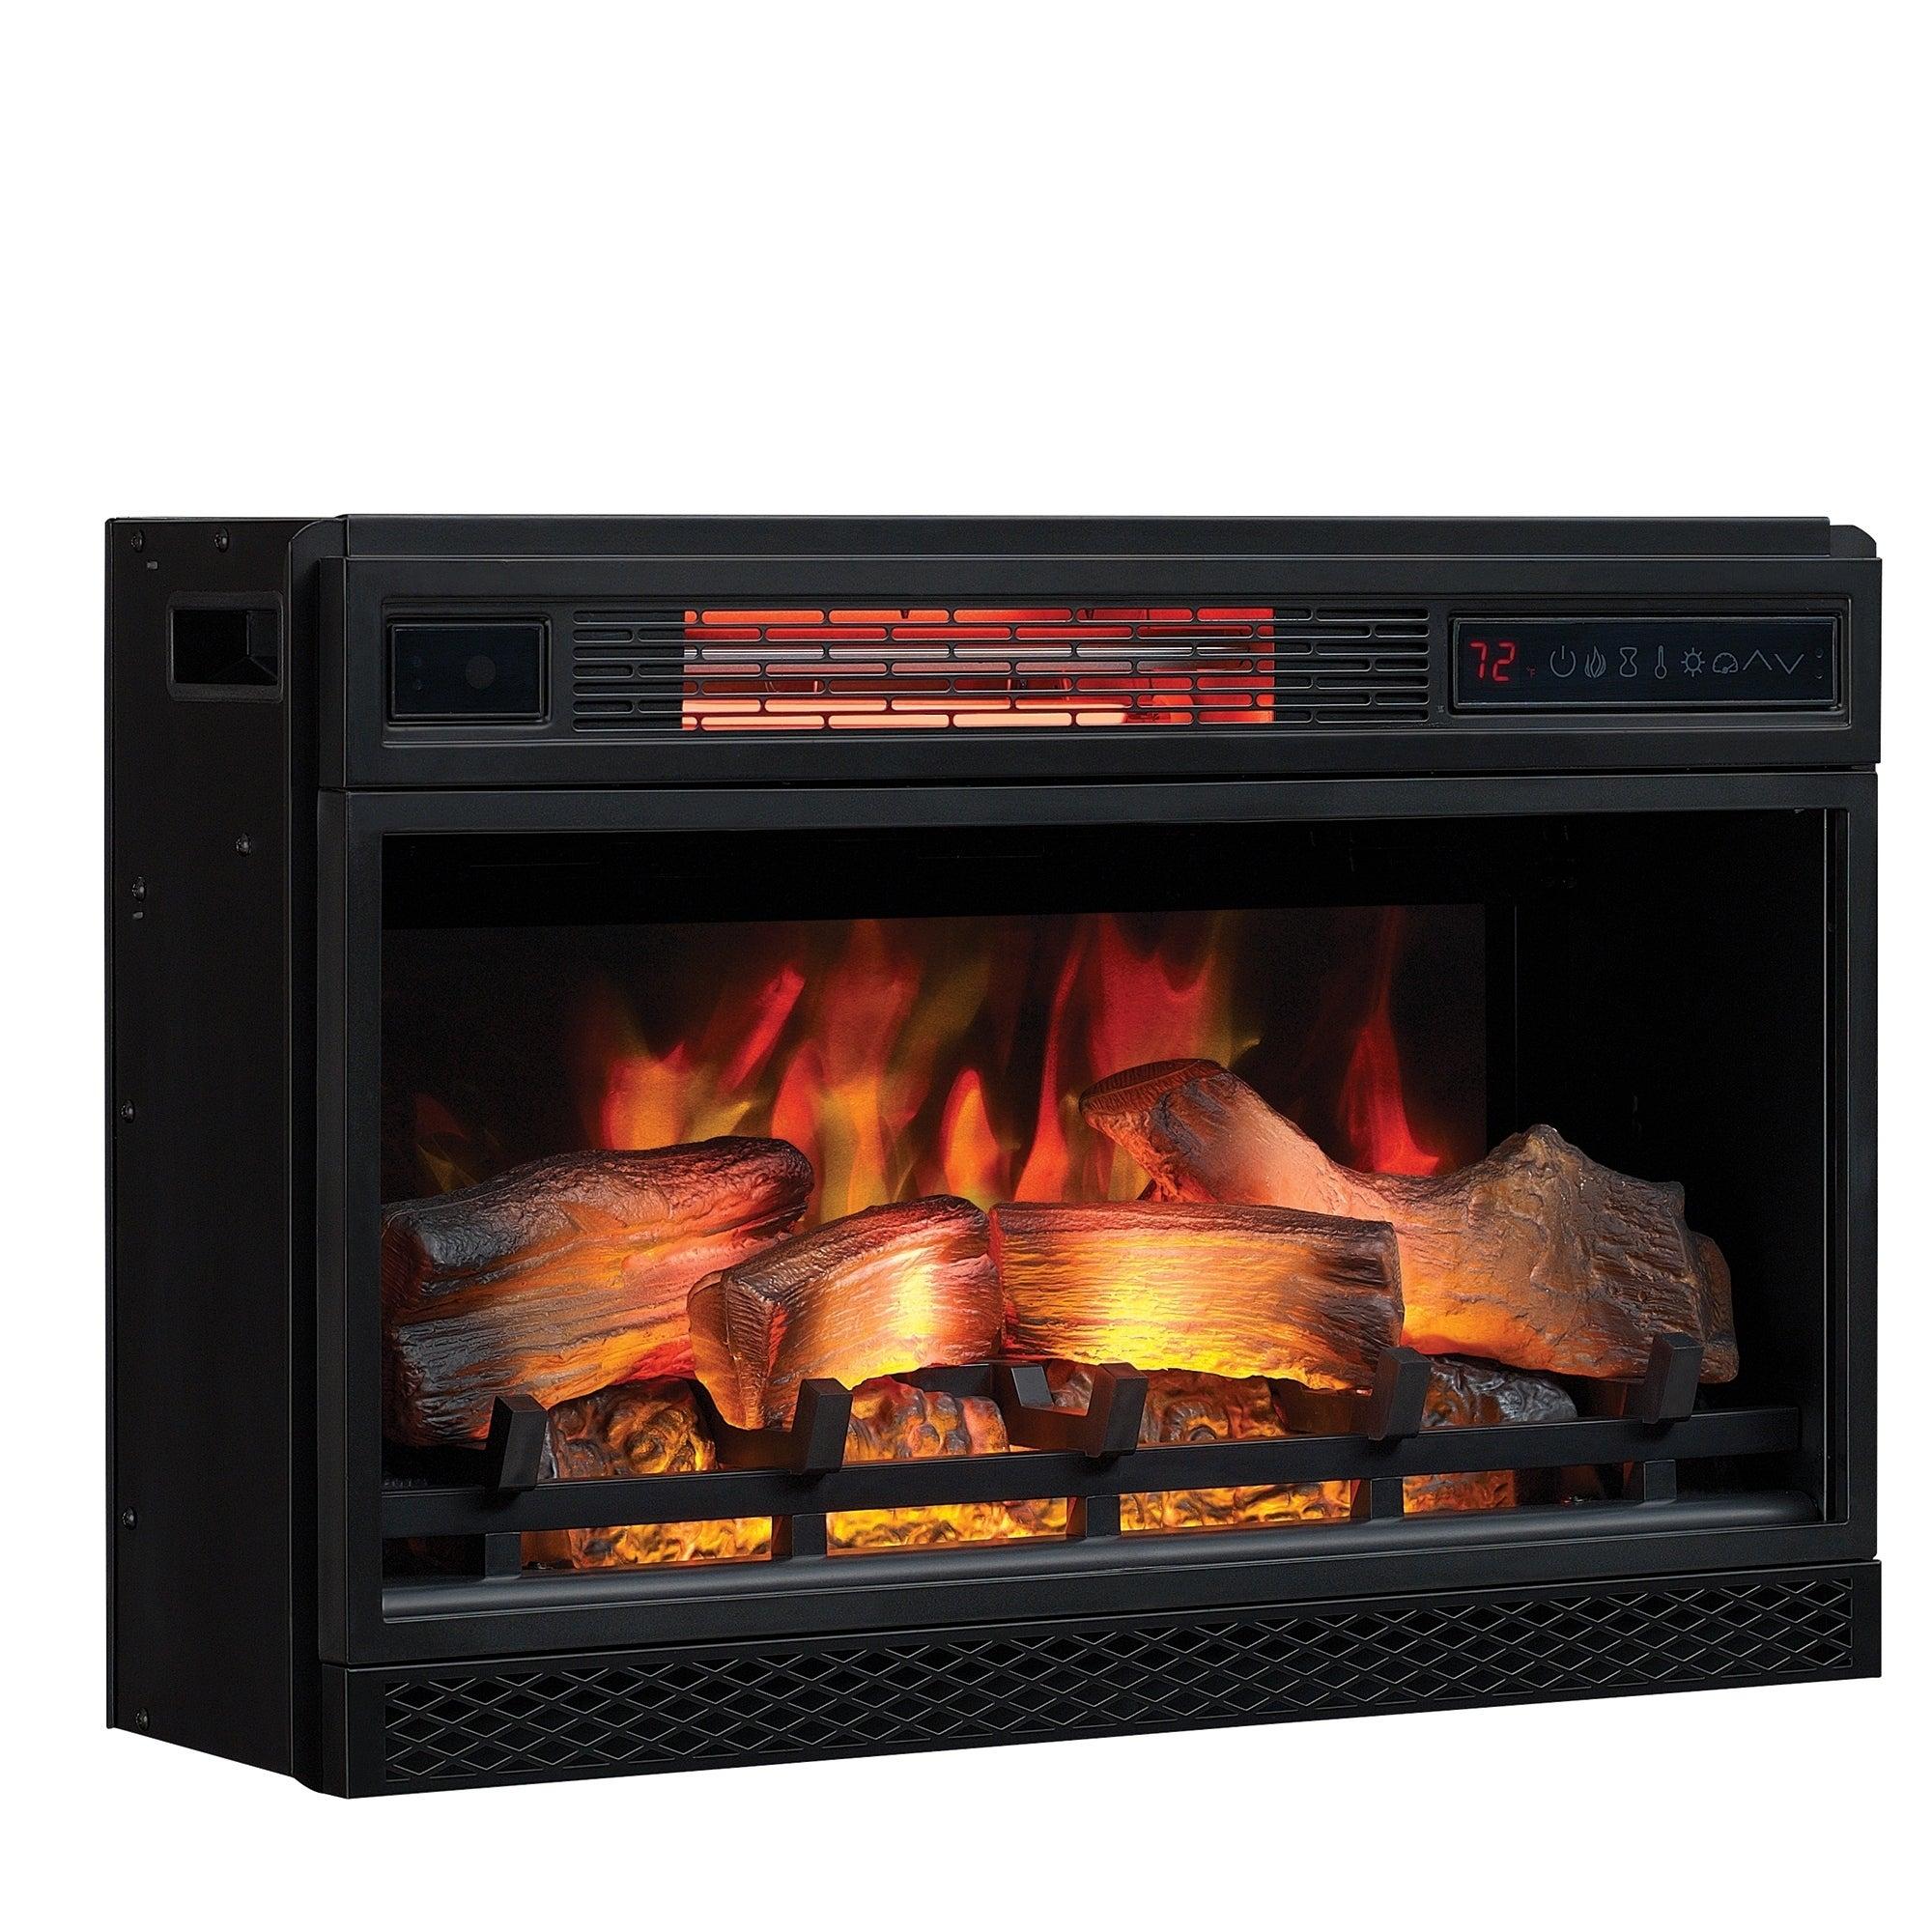 ClassicFlame 26 3D Infrared Quartz Electric Fireplace Insert f70 bc46 40d2 a7c6 afc8db79d6cc